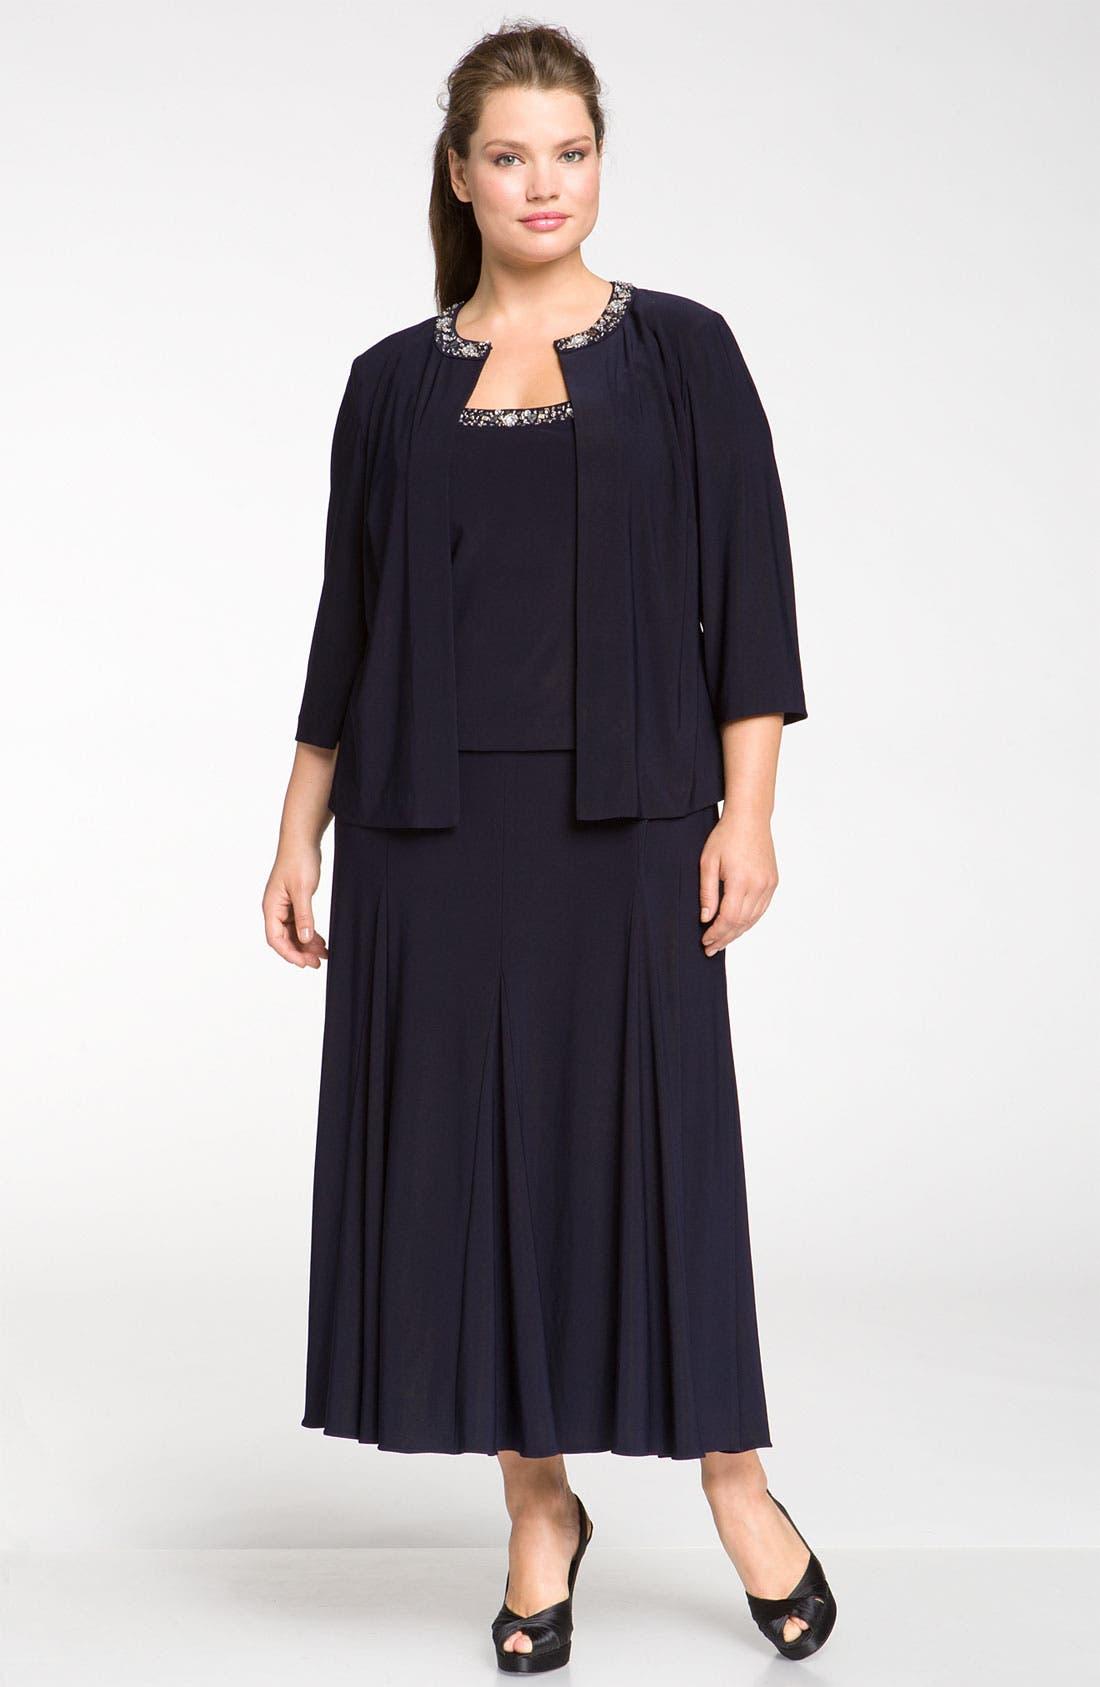 Main Image - Alex Evenings Beaded Dress & Jacket (Plus Size)